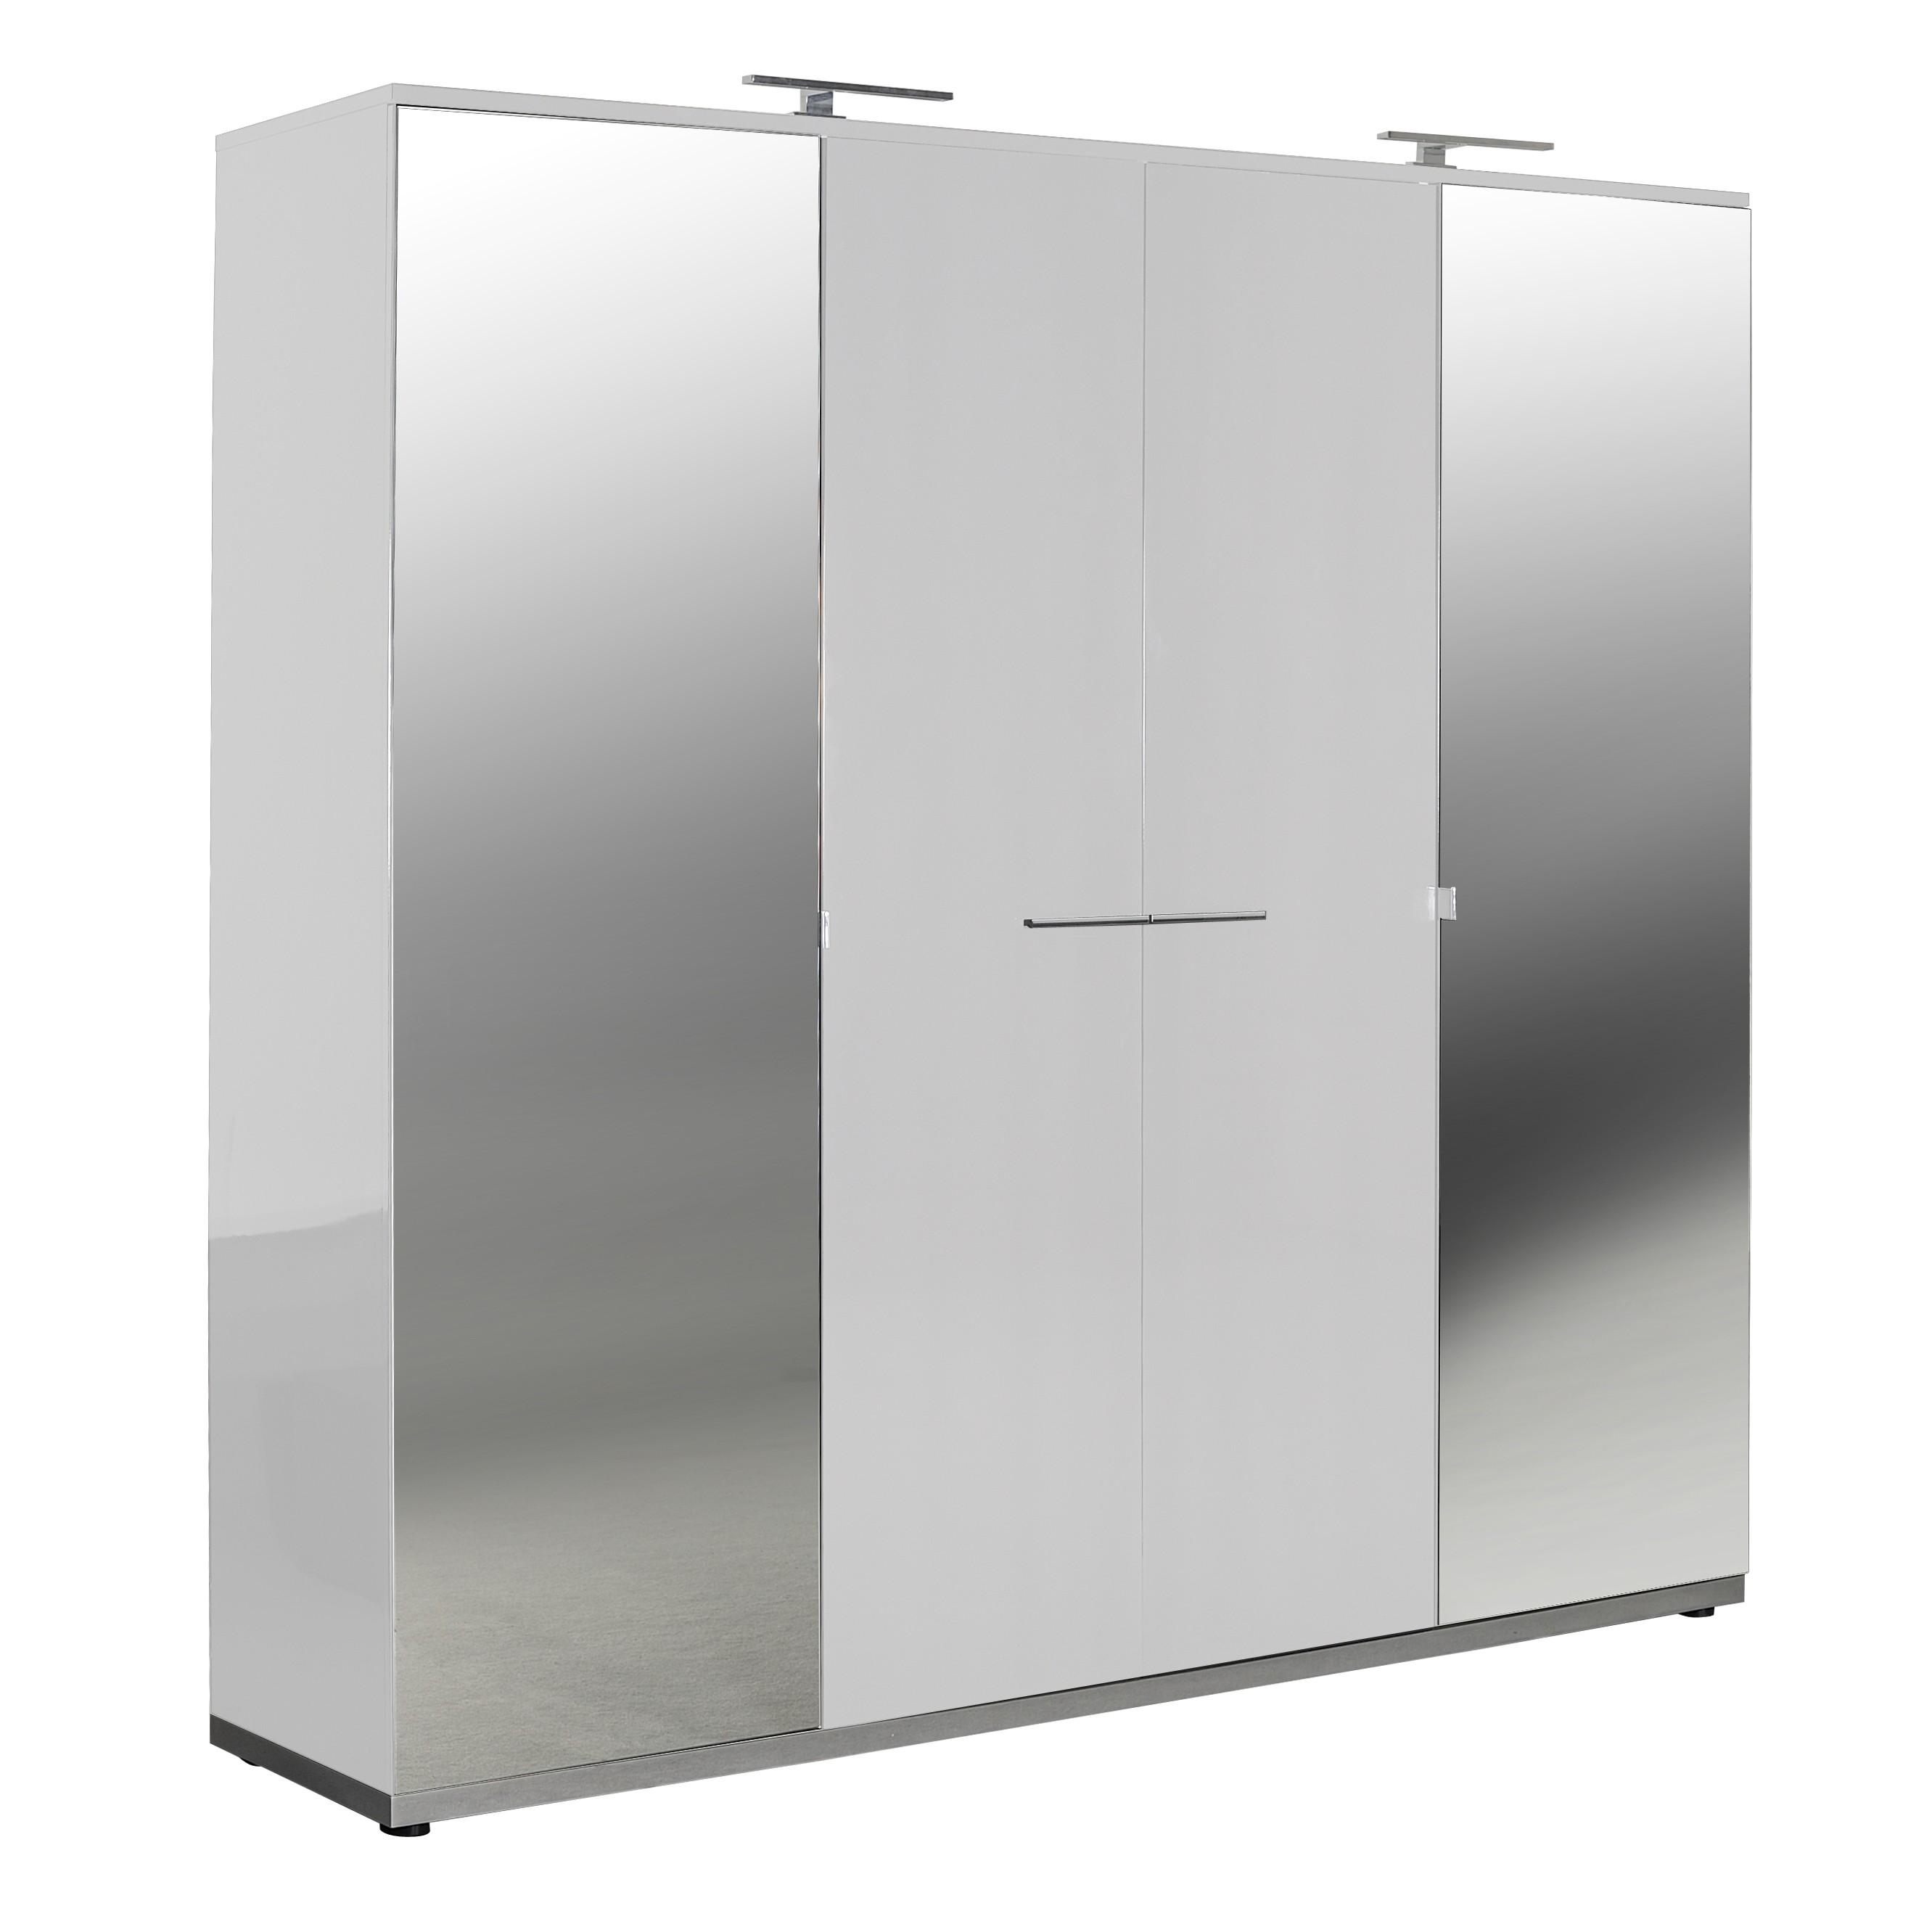 armoire design laqu e blanche 4 portes italya. Black Bedroom Furniture Sets. Home Design Ideas